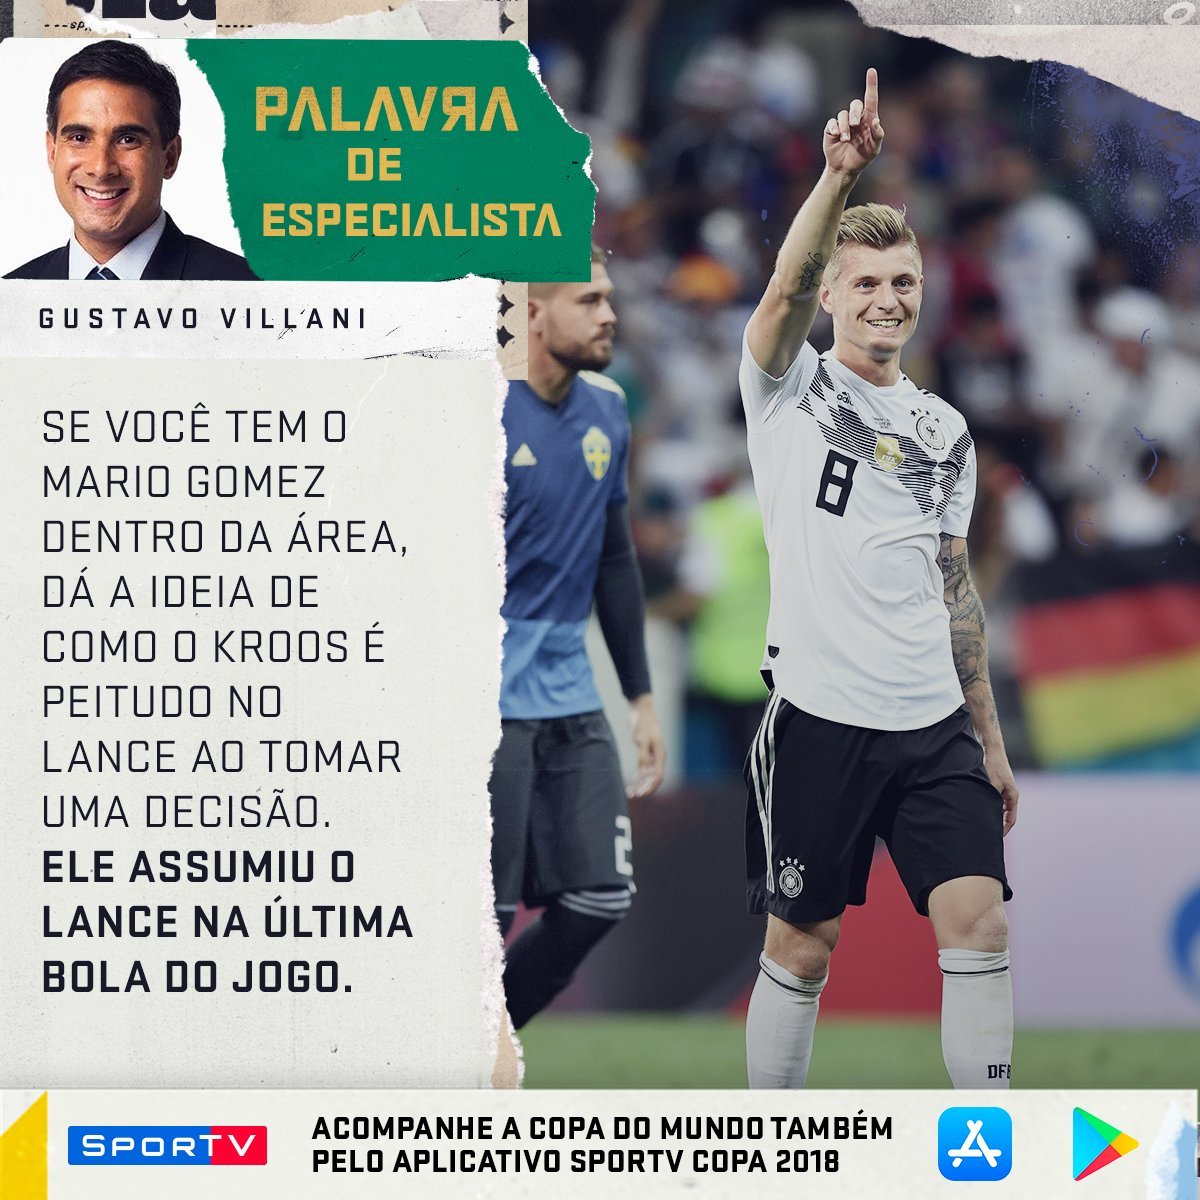 O cara chamou a RESPONSA pra decidir!  Acompanhe tudo sobre a Copa do Mundo no aplicativo do SporTV! #SouSporTVnaCopa  Android: https://t.co/pM3IzWAgDi  IOS: https://t.co/zO8wCn0Vby